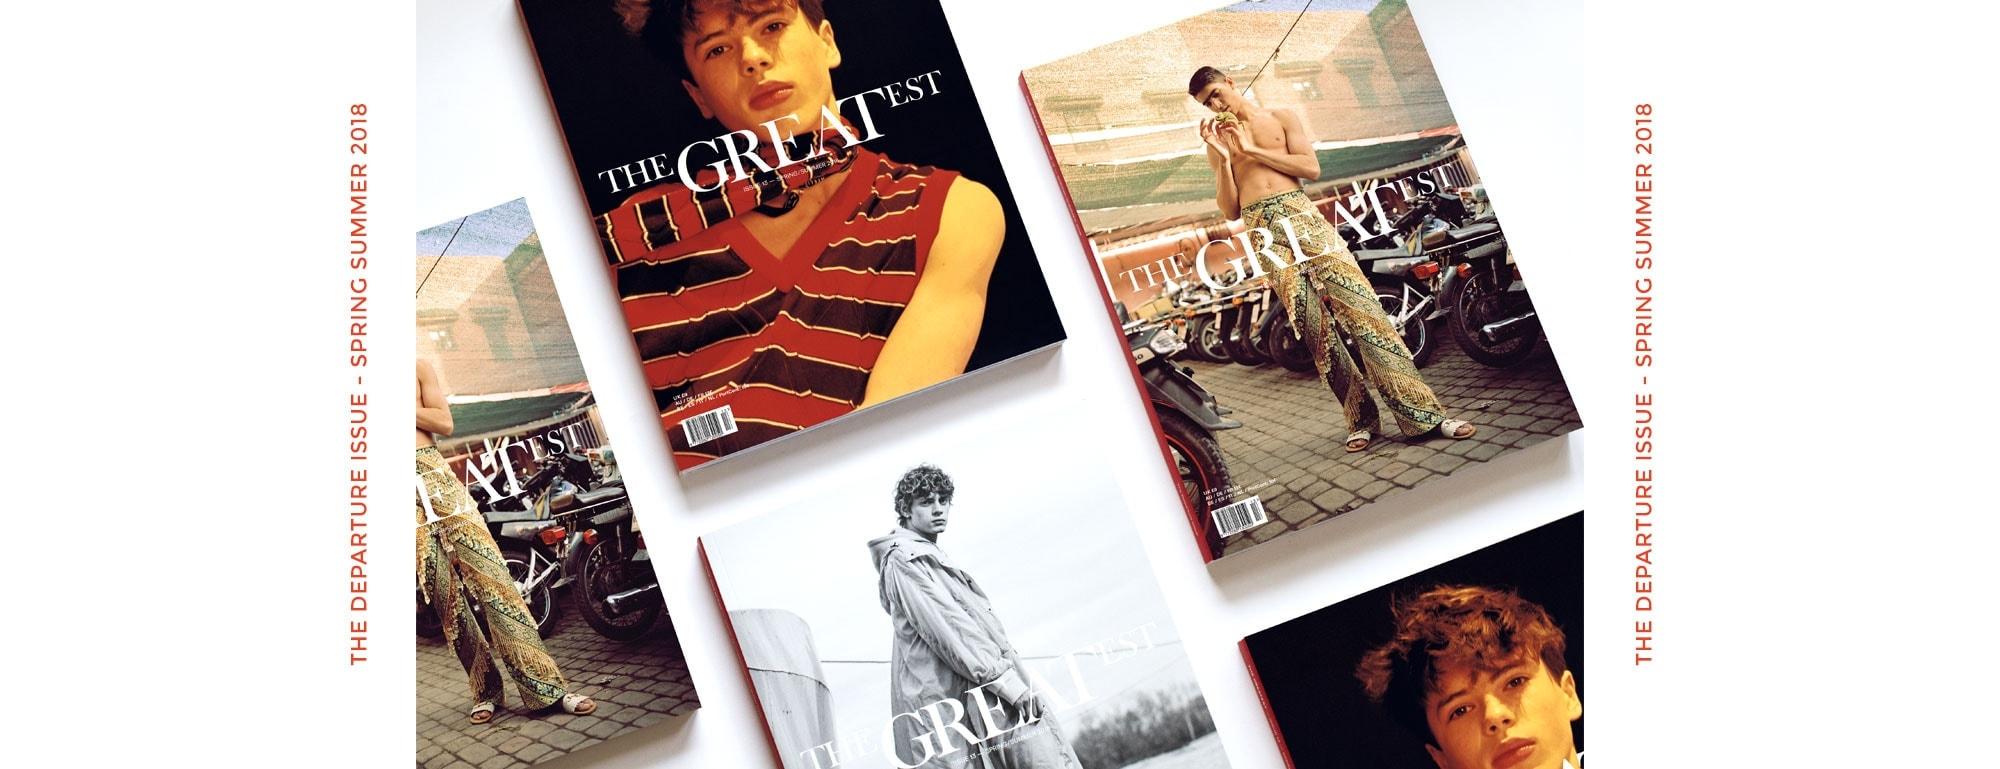 the greatest magazine